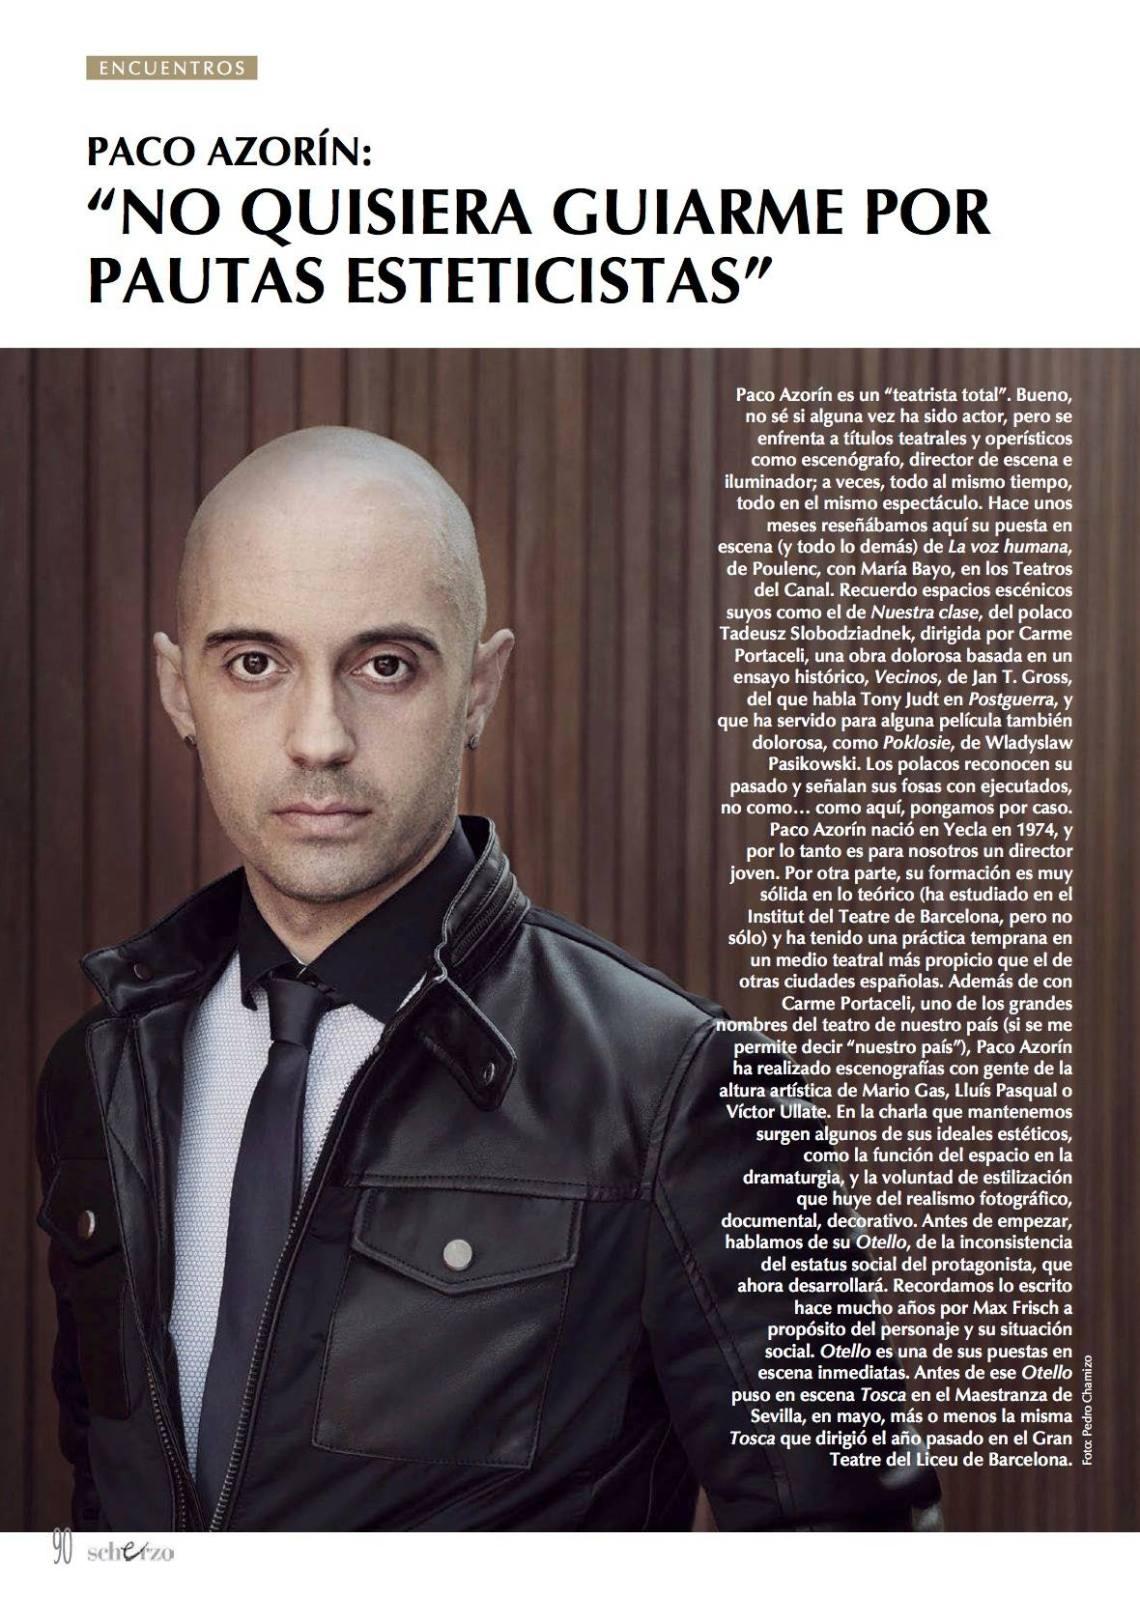 Paco Azorín en la Revista Scherzo. Oct 2015. 1